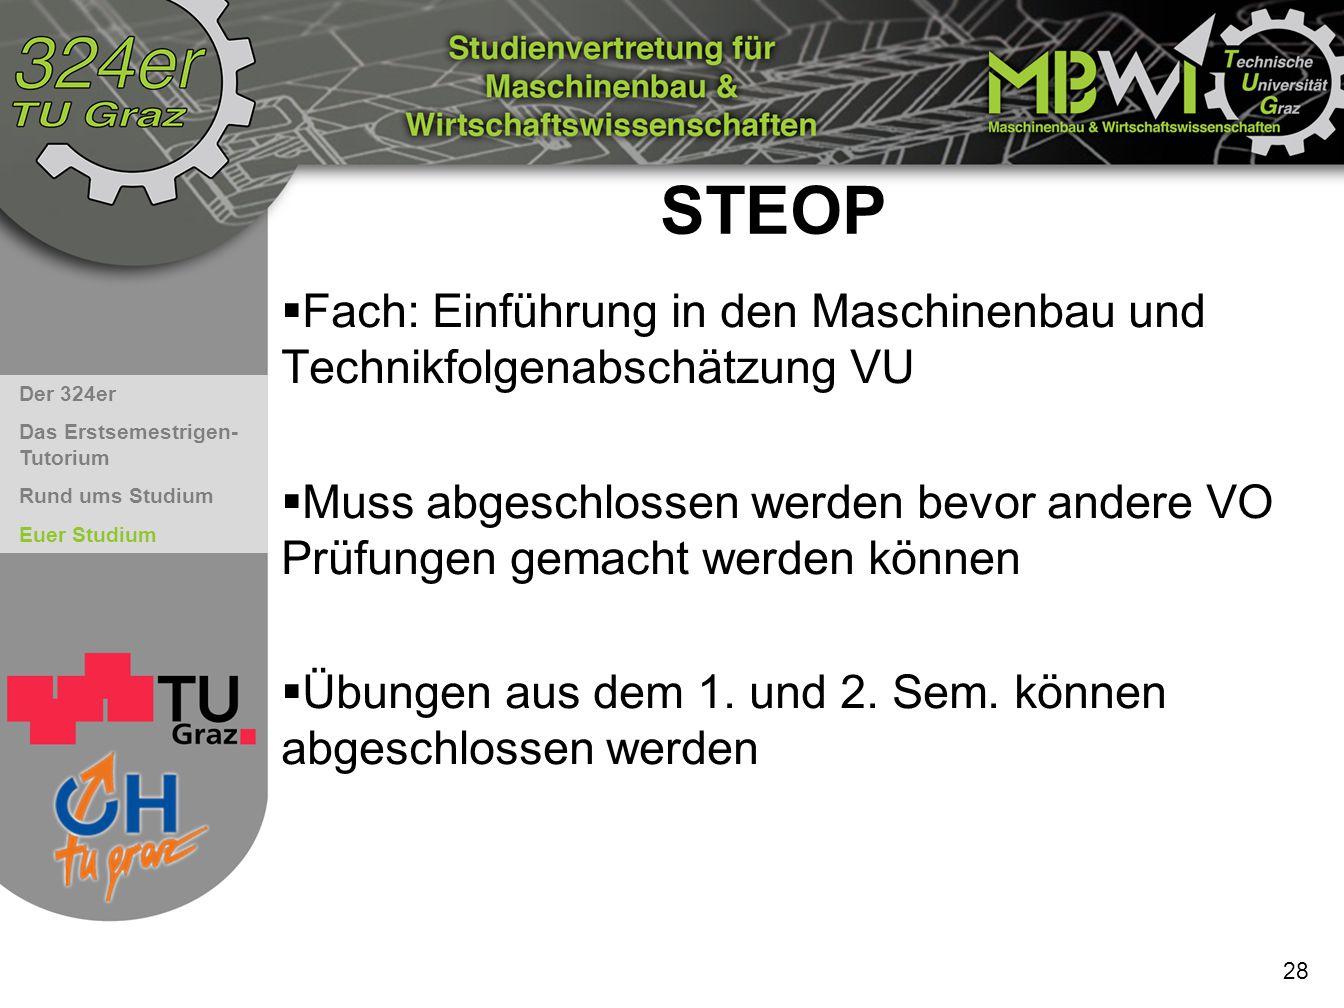 STEOP Fach: Einführung in den Maschinenbau und Technikfolgenabschätzung VU.